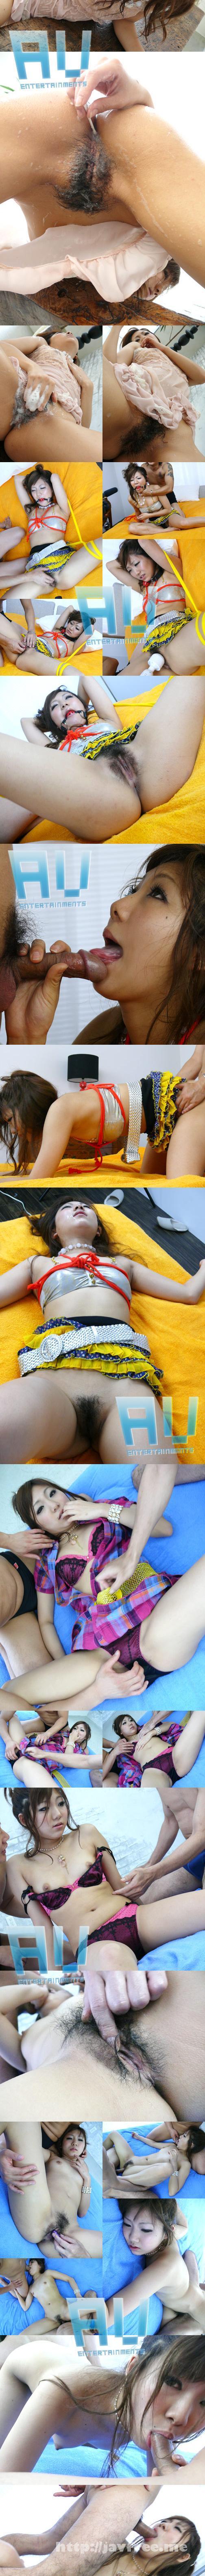 [EB 02] Ero Body Vol. 2 : 椿まひる 椿まひる Mahiru Tsubaki EB